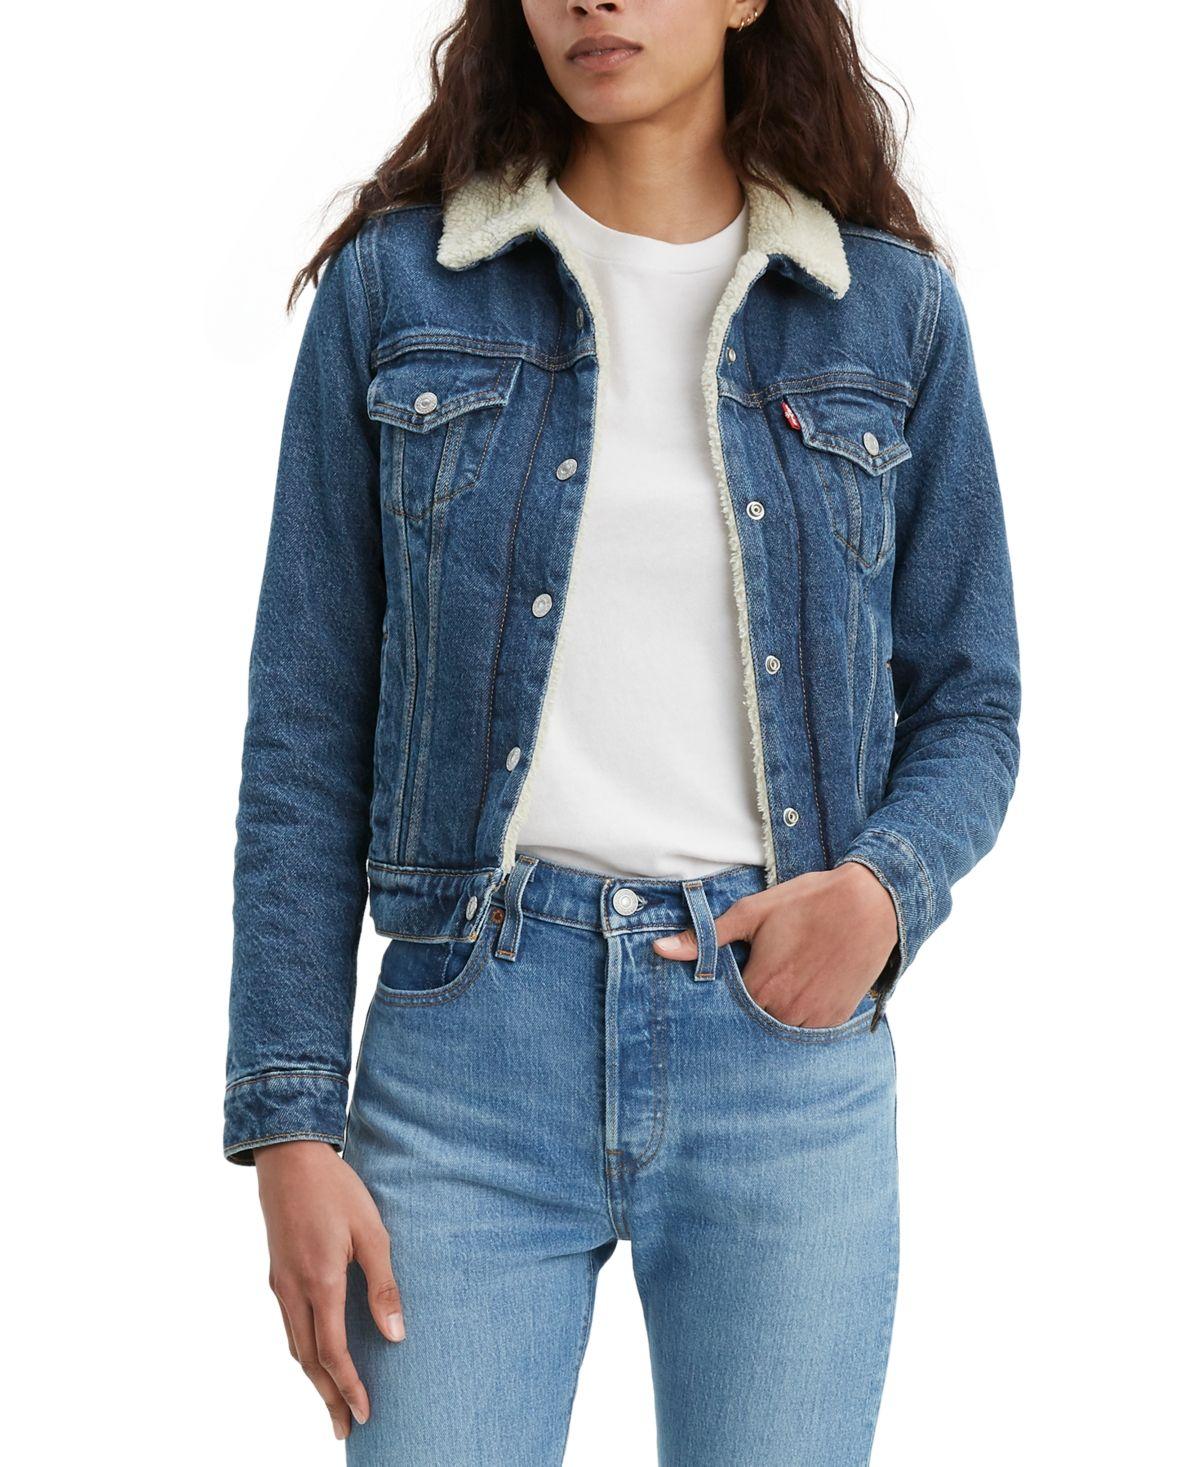 The Jacket I Have In The Brick Mortar Shade Jacket Outfit Women Fur Lined Denim Jacket Denim Jacket Women [ 1467 x 1200 Pixel ]